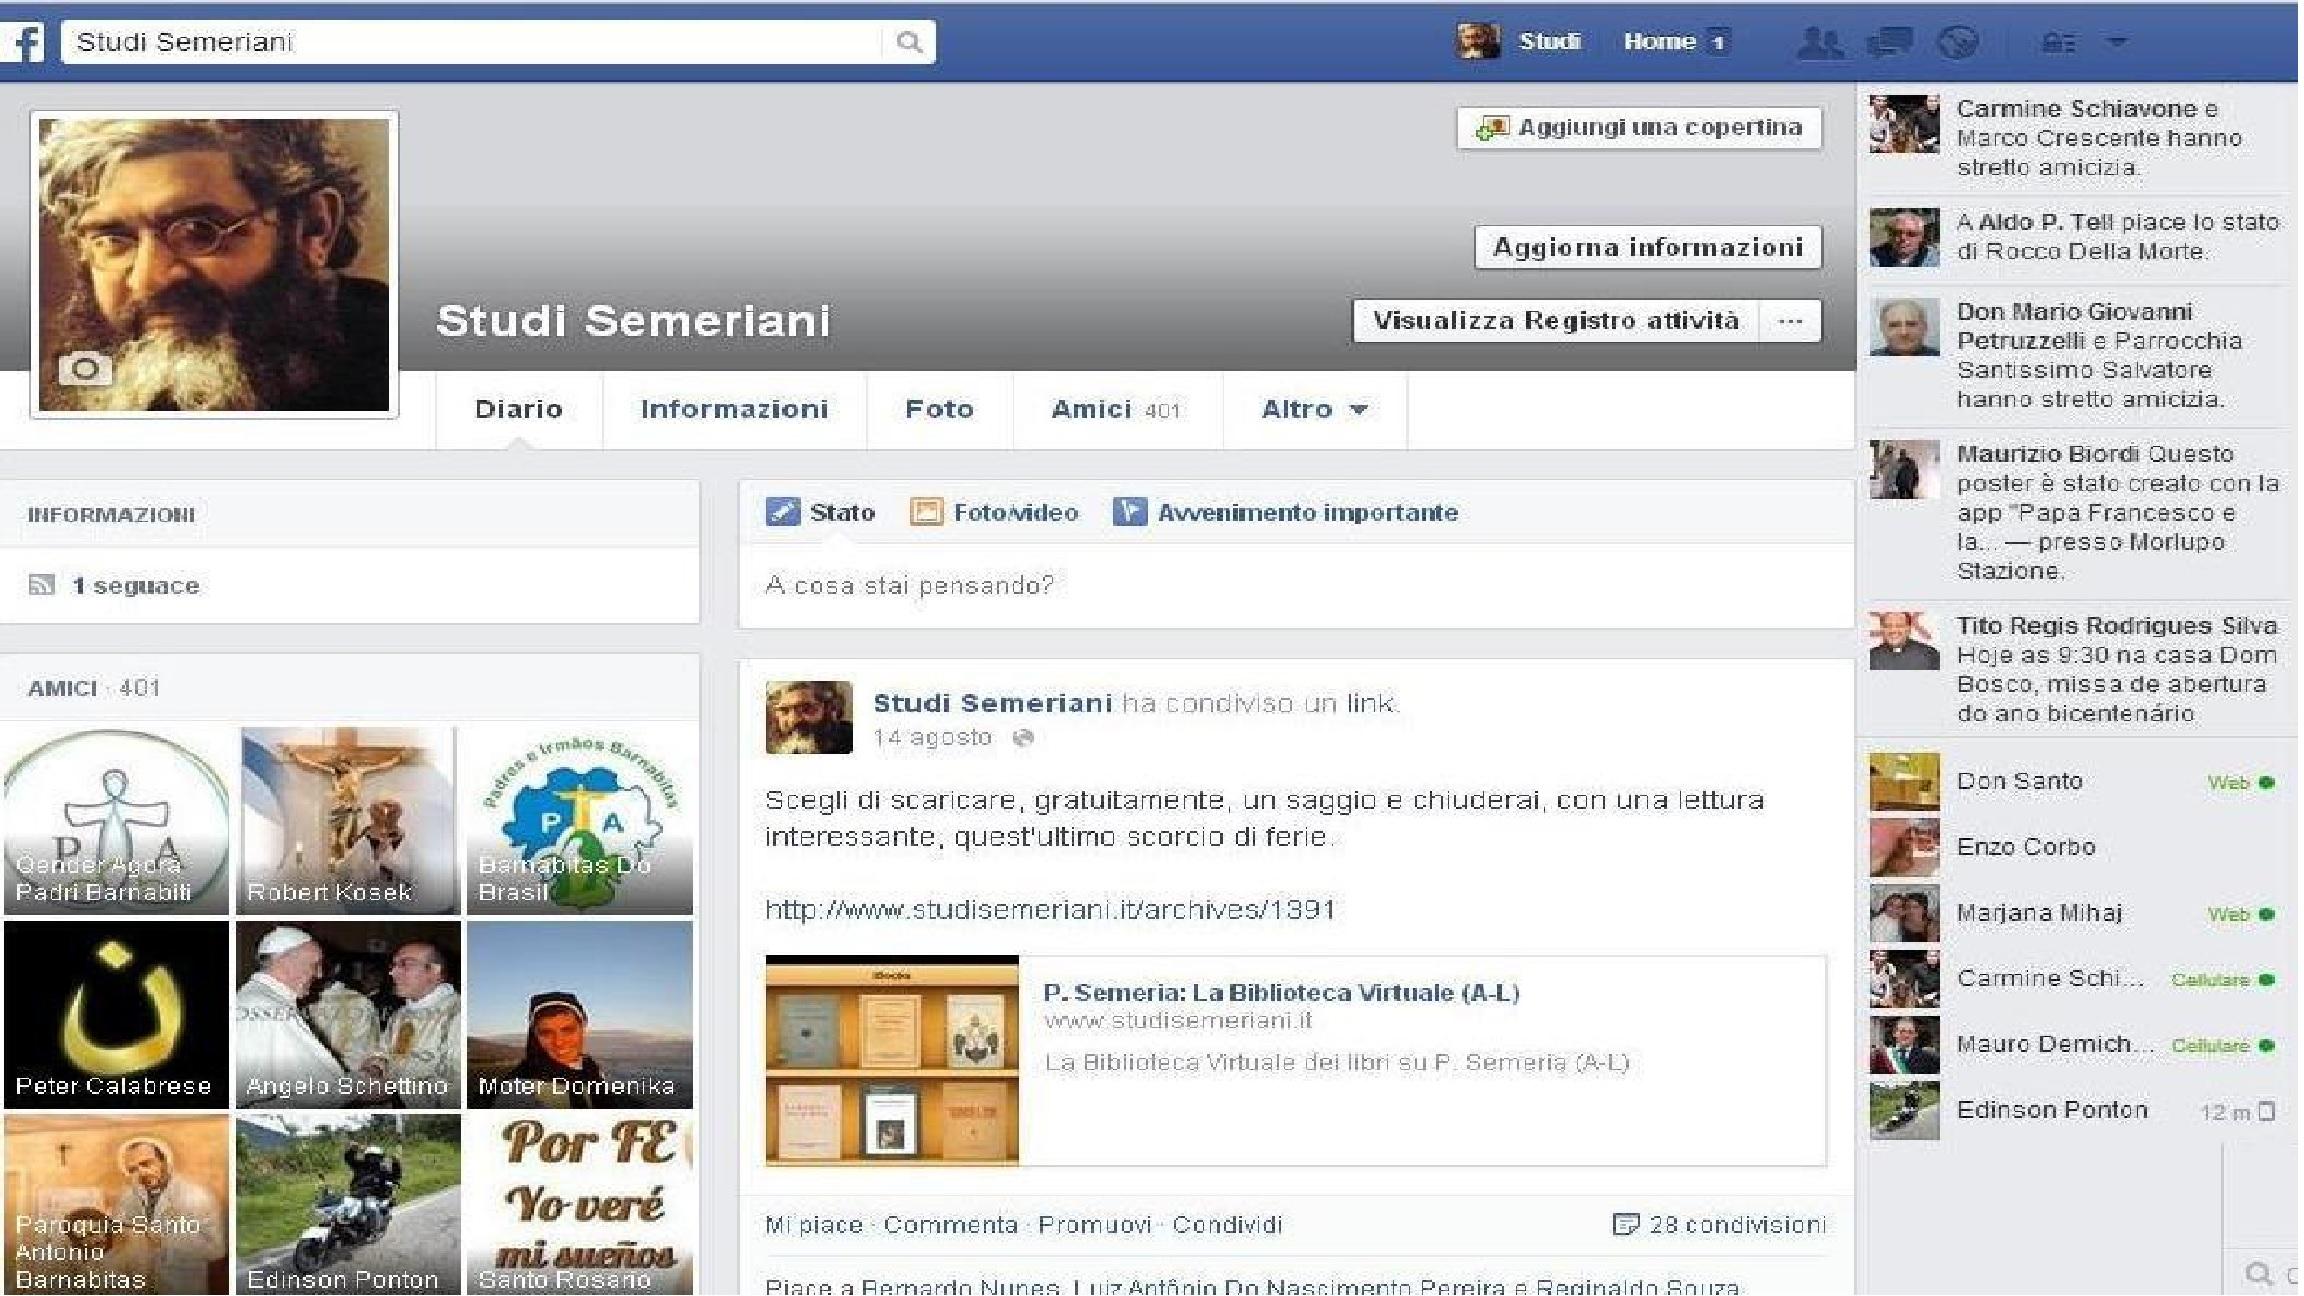 Studi Semeriani: account Facebook